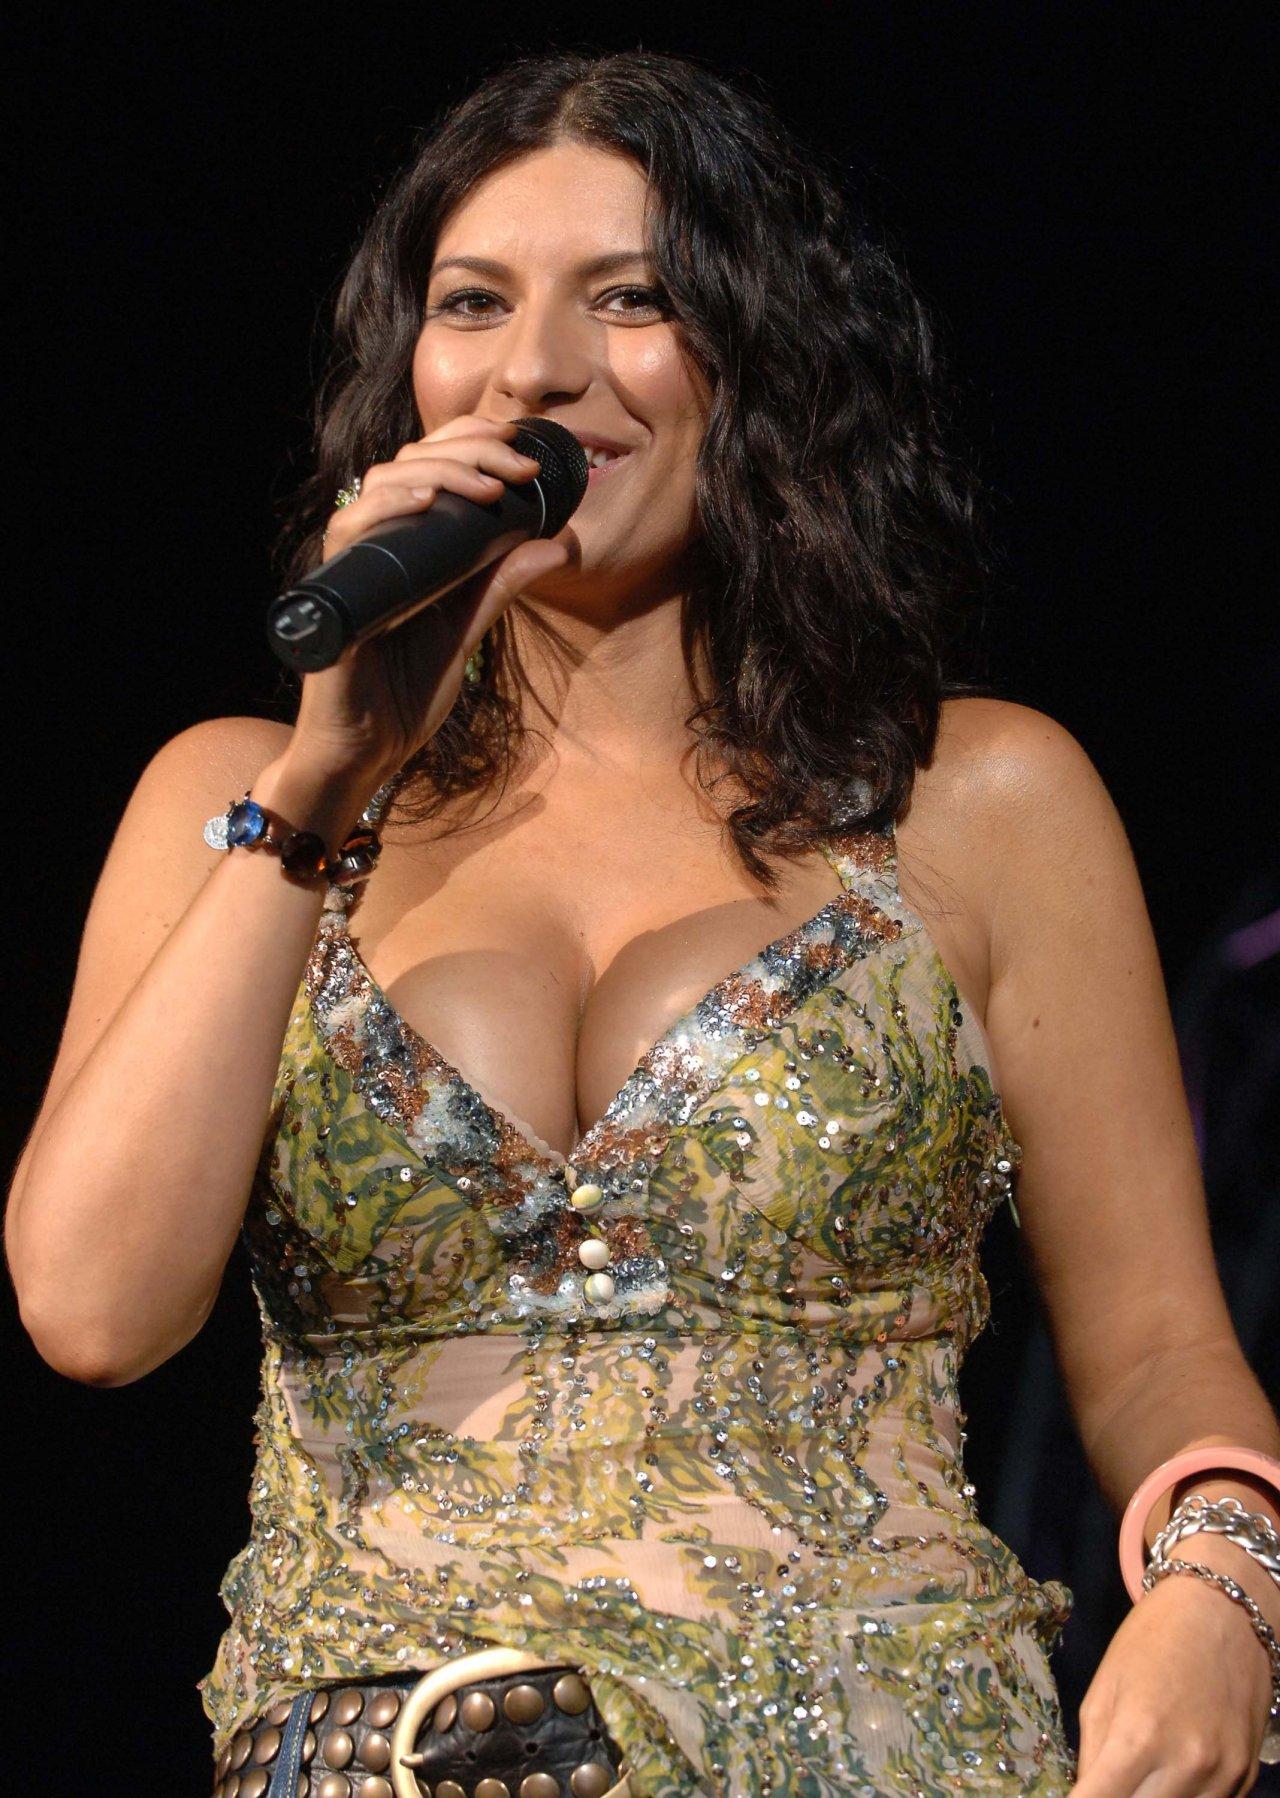 Laura pausini show pussy concert feria del hogar lima 2014 - 3 part 9